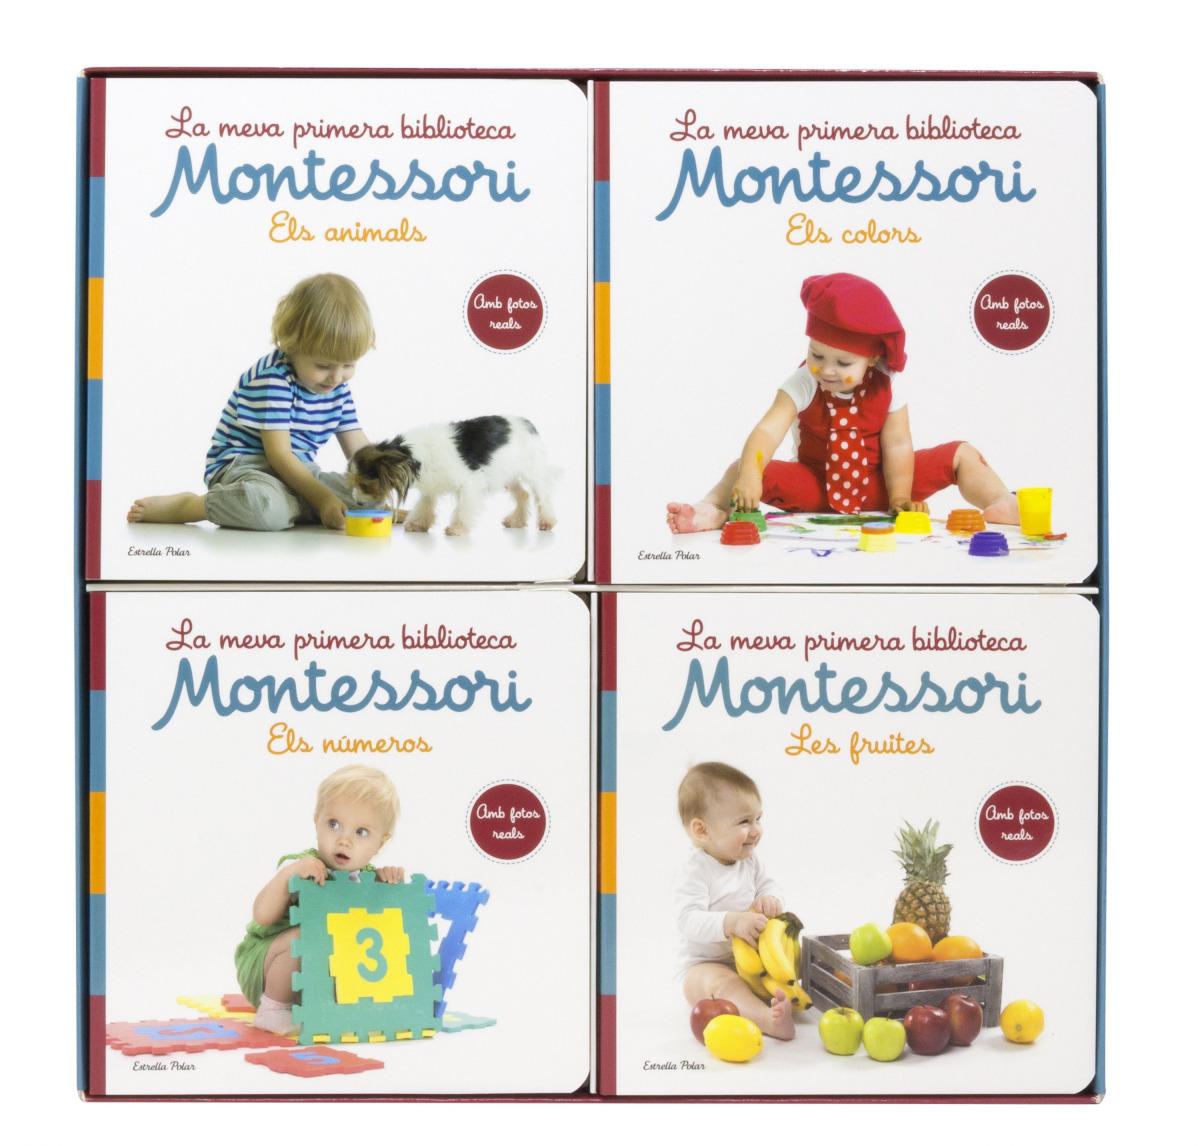 La meva primera biblioteca Montessori